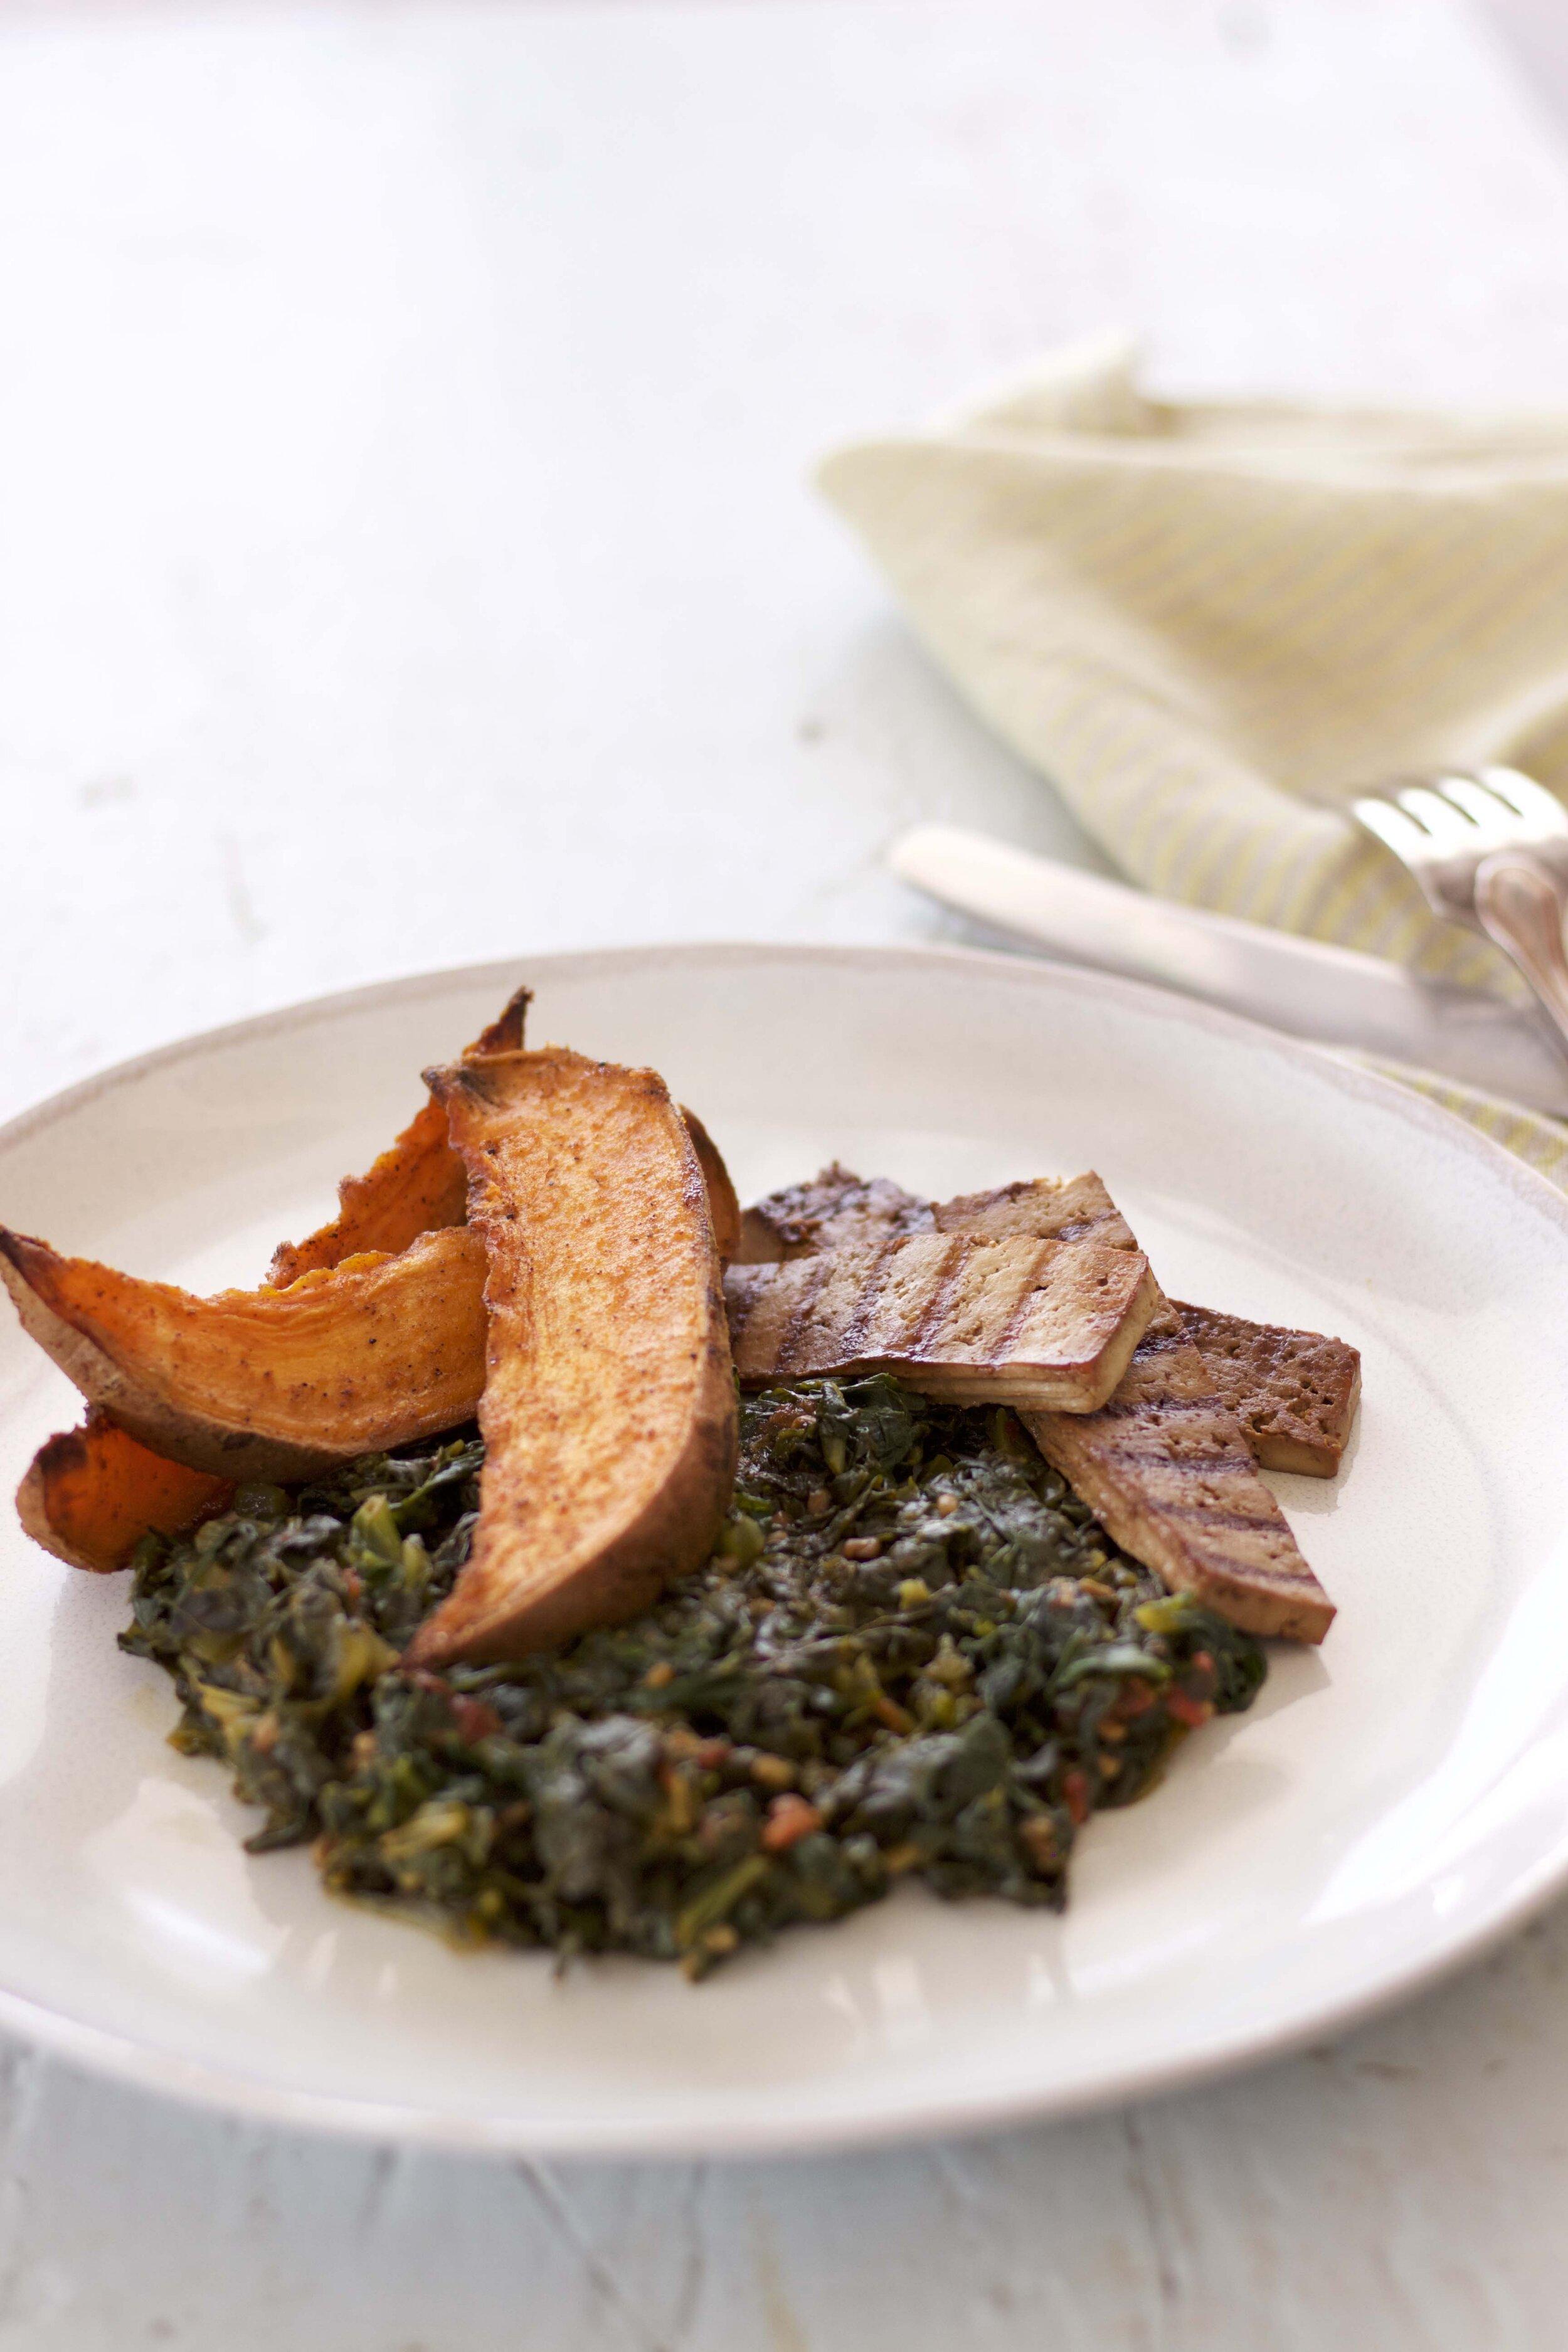 recette-ayurvedique-patates-douces-roties-epinards-tofu-grille.jpg